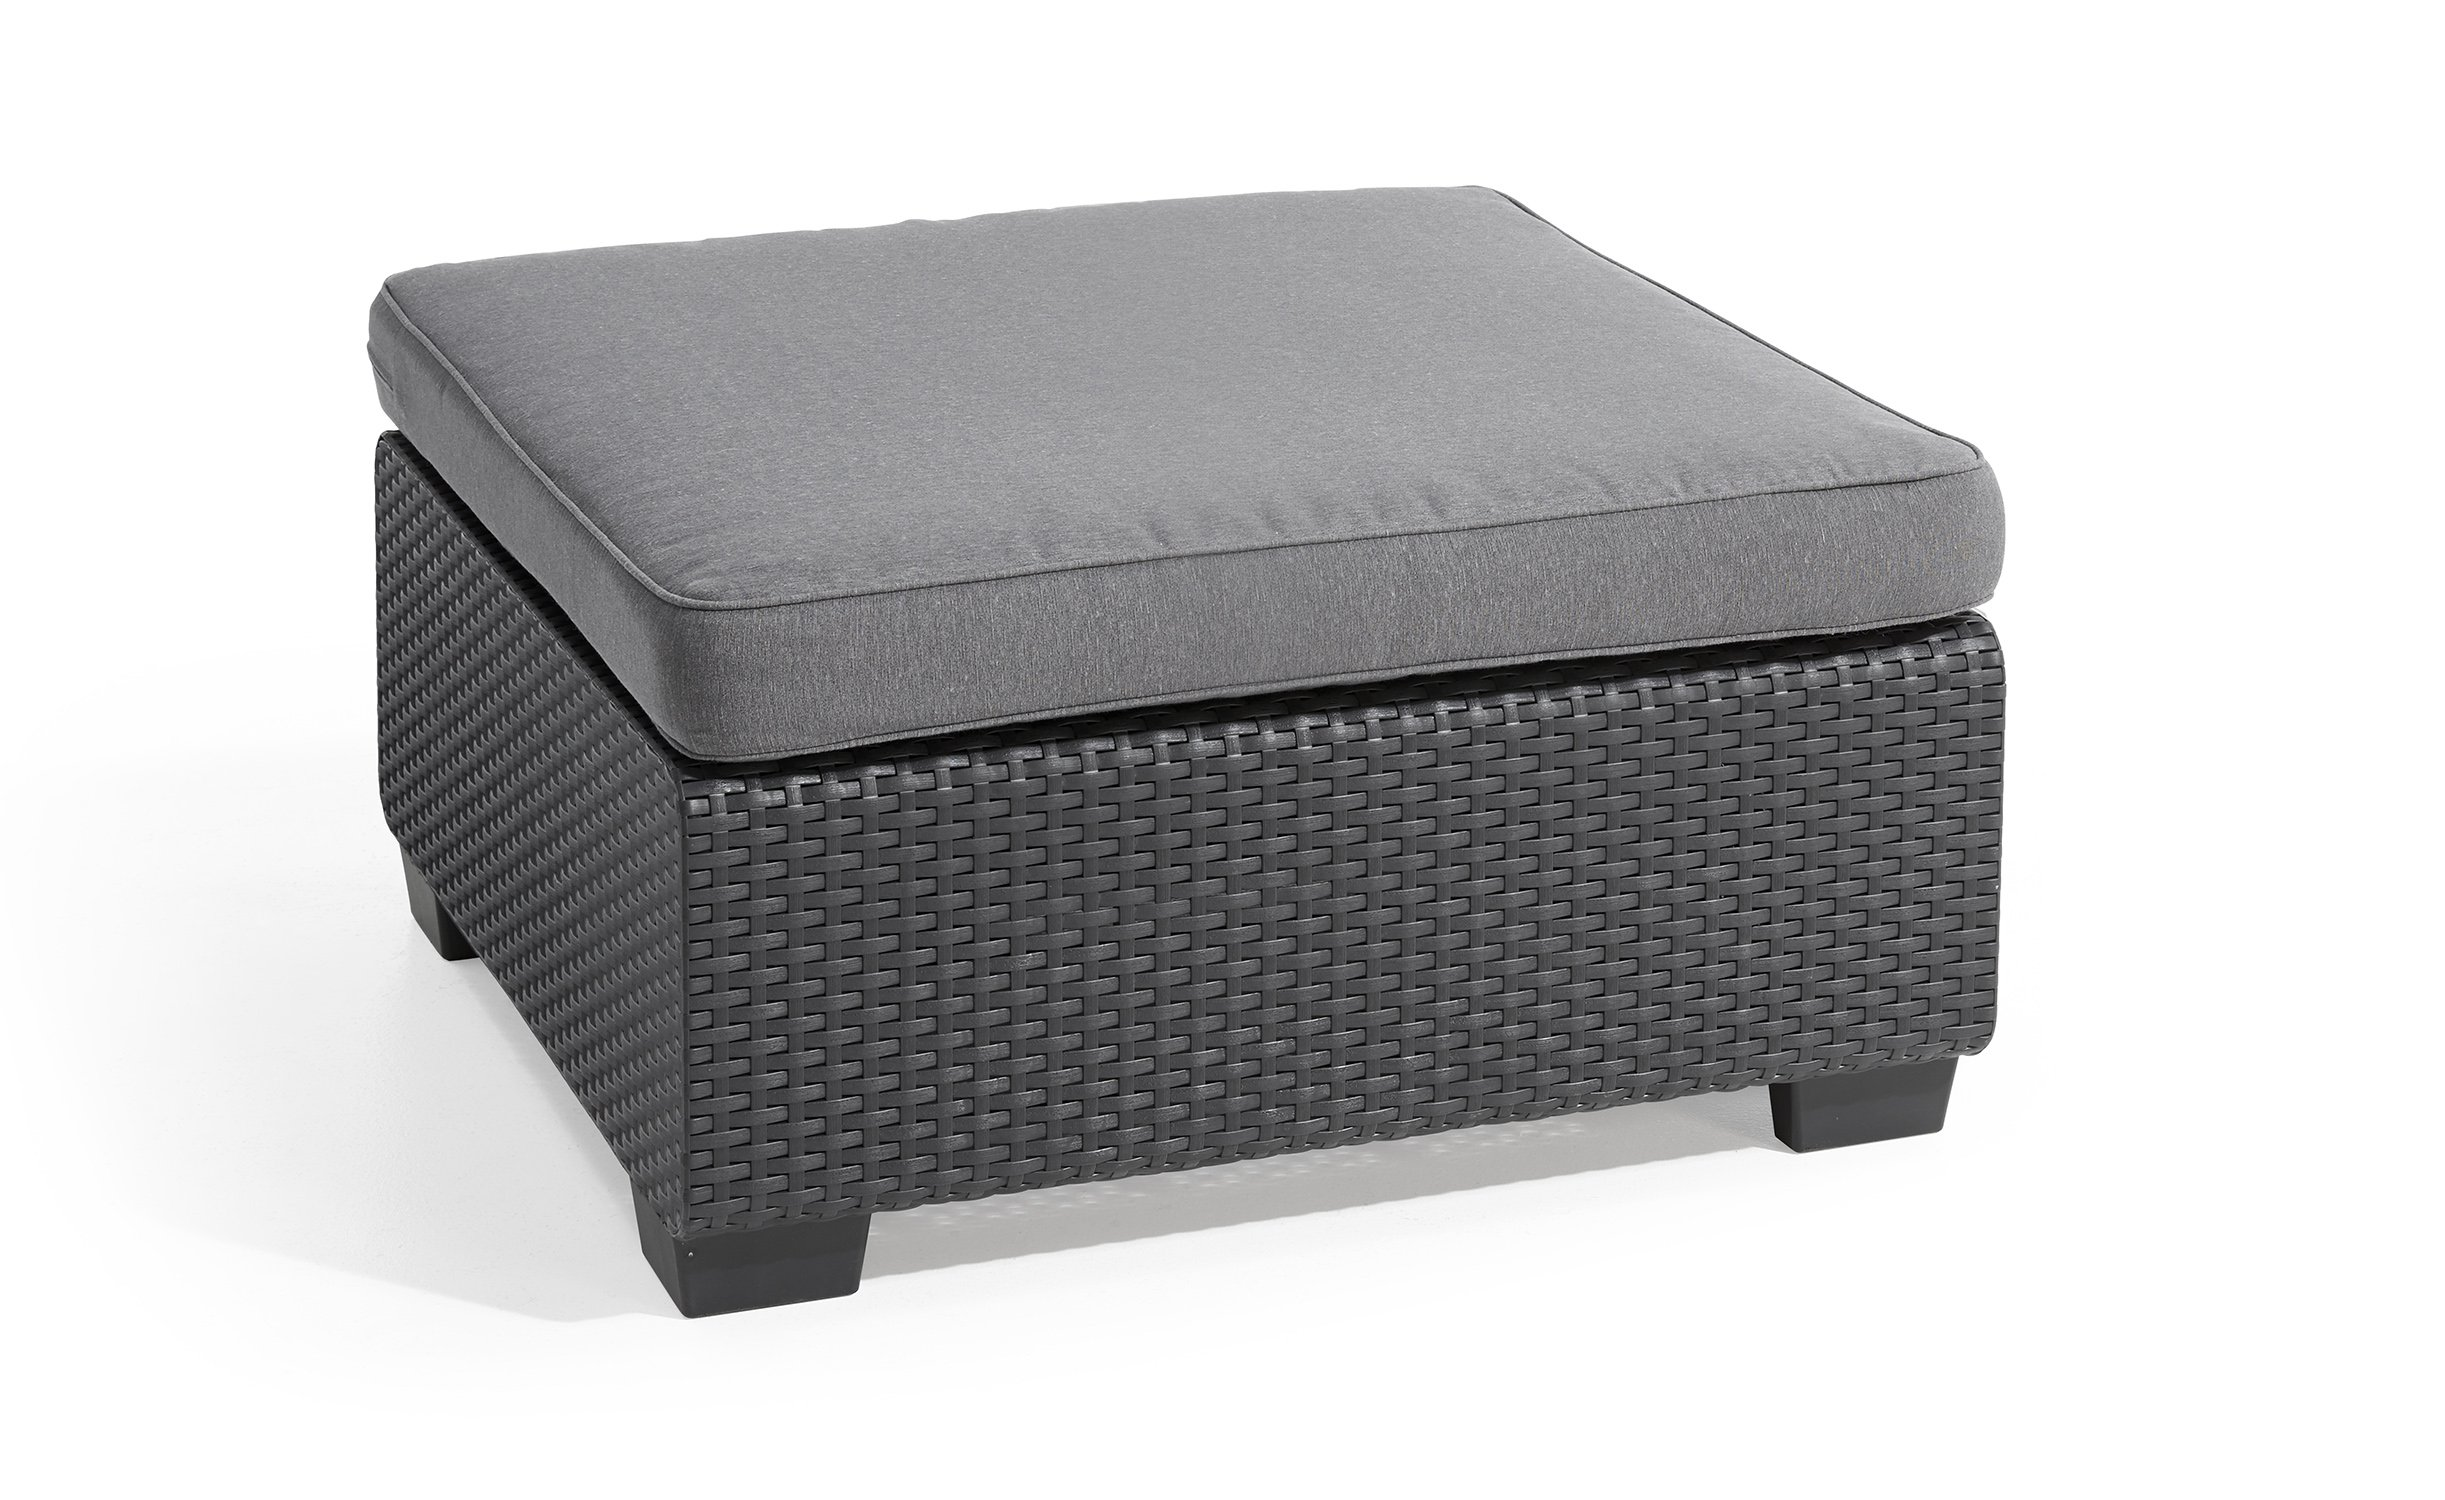 Keter 240145 Sapporo Sunbrella Cushion, Grey Stool, Graphite by Keter